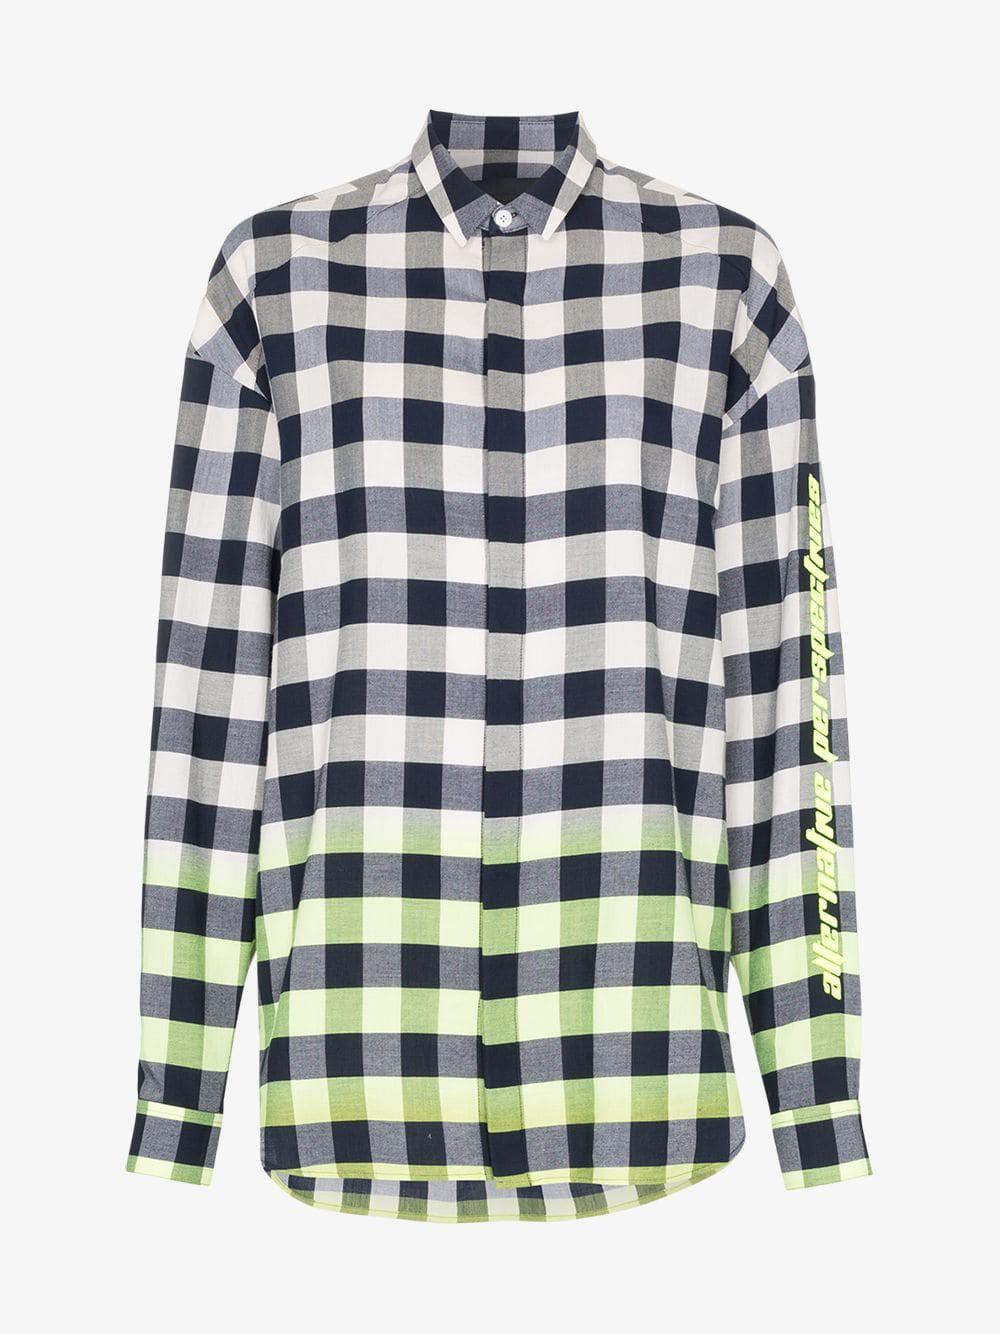 Juun.J dip-dye checked-cotton shirt in blue / white / yellow